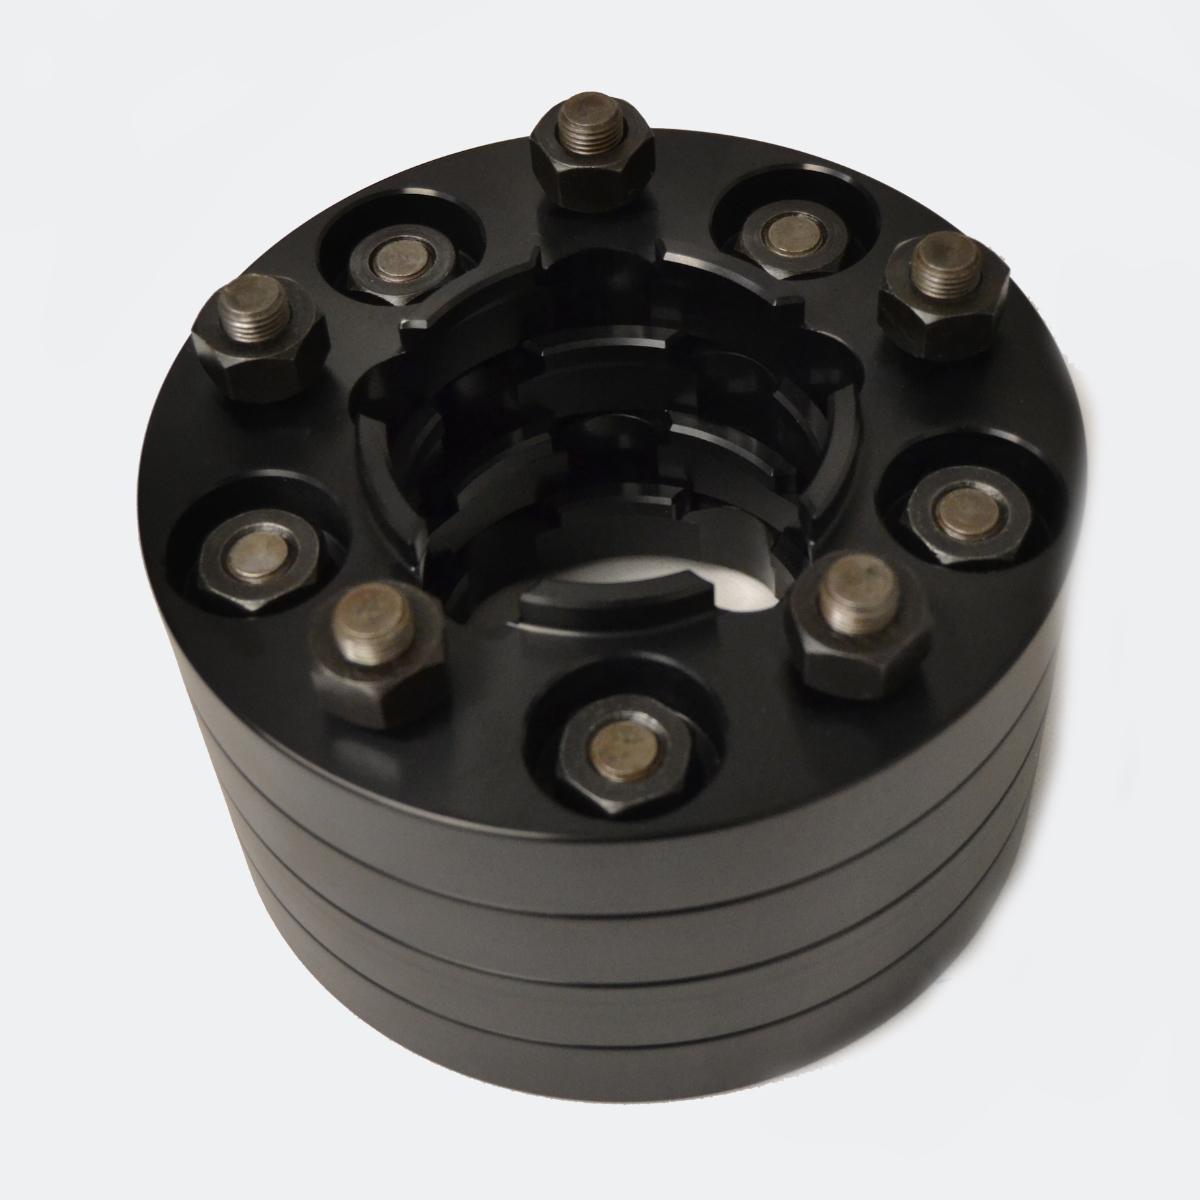 Land Rover Defender Wheel Spacers 30mm Black